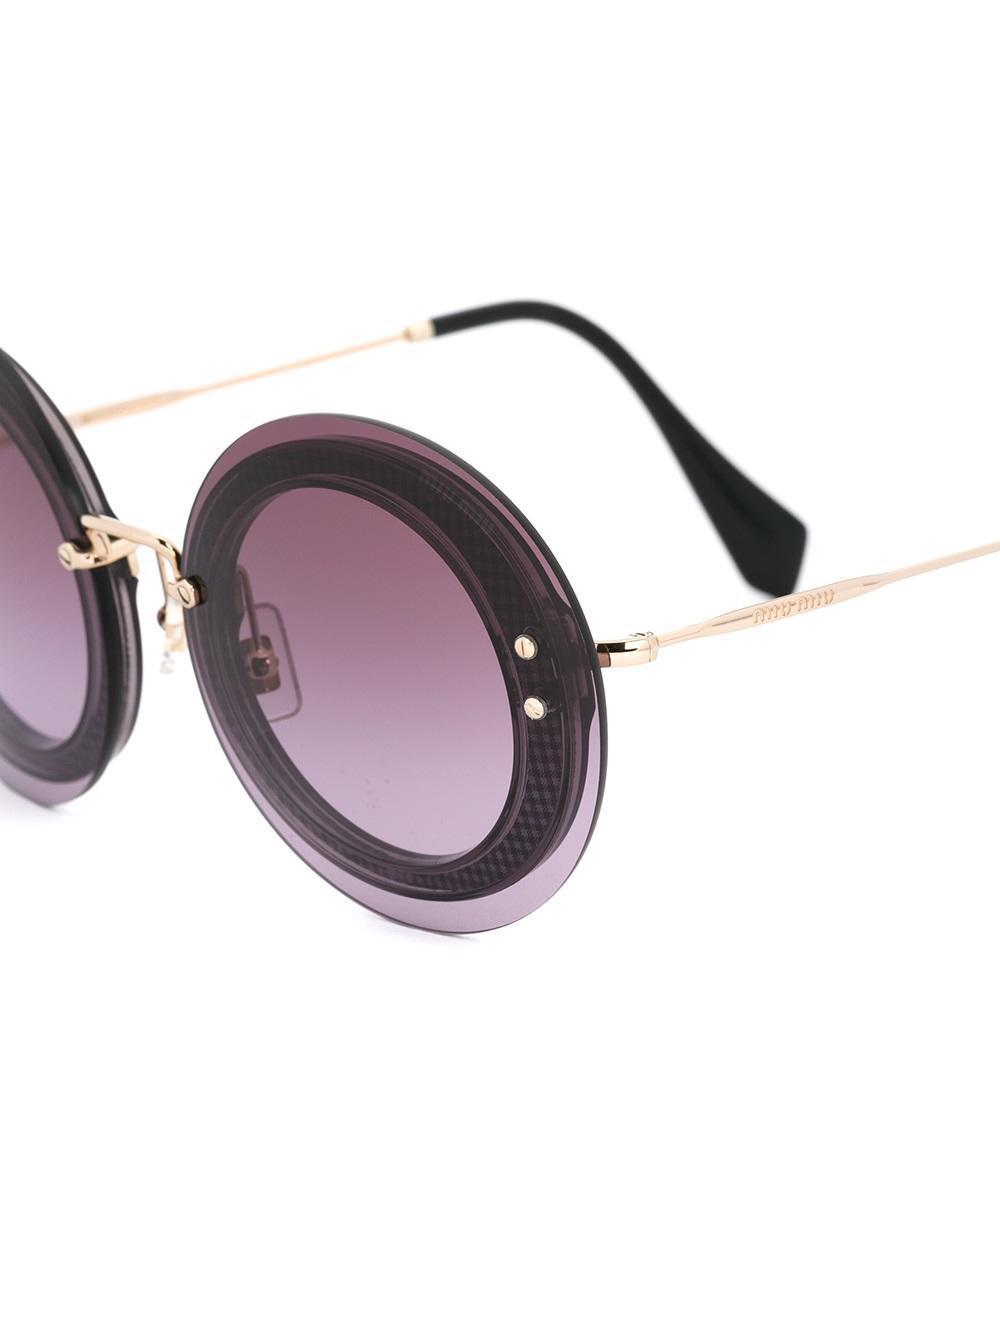 94401edeb11 Miu Miu - Multicolor Oversize Round Pattern Sunglasses - Lyst. View  fullscreen